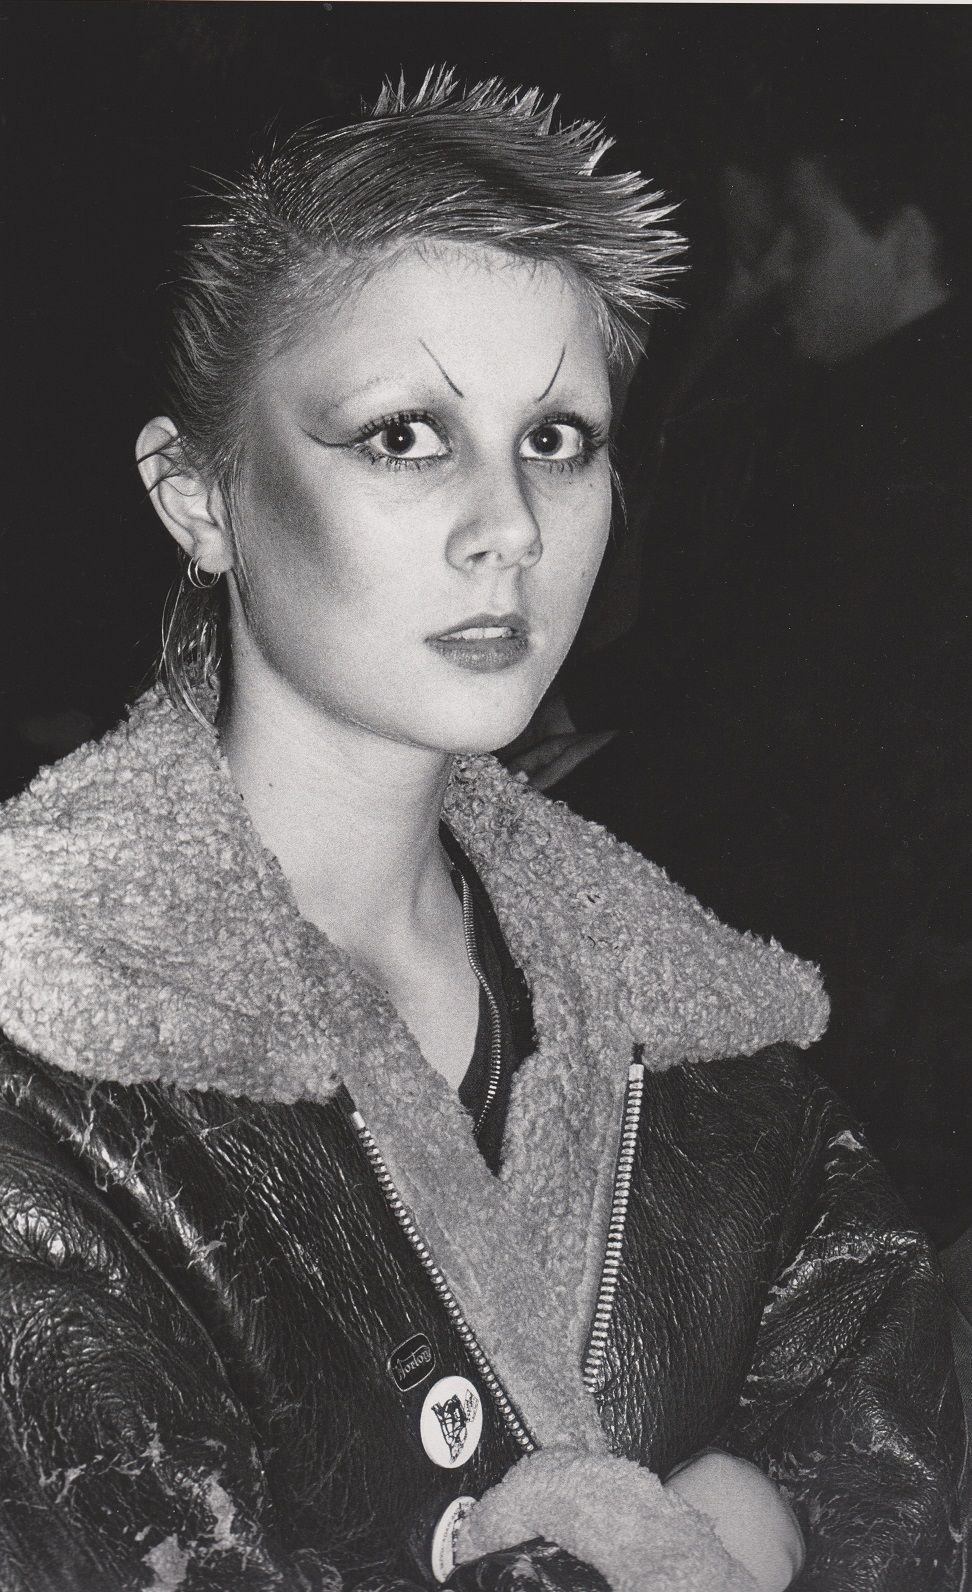 Derek Ridgers' London Youth, At Billy's, 1979